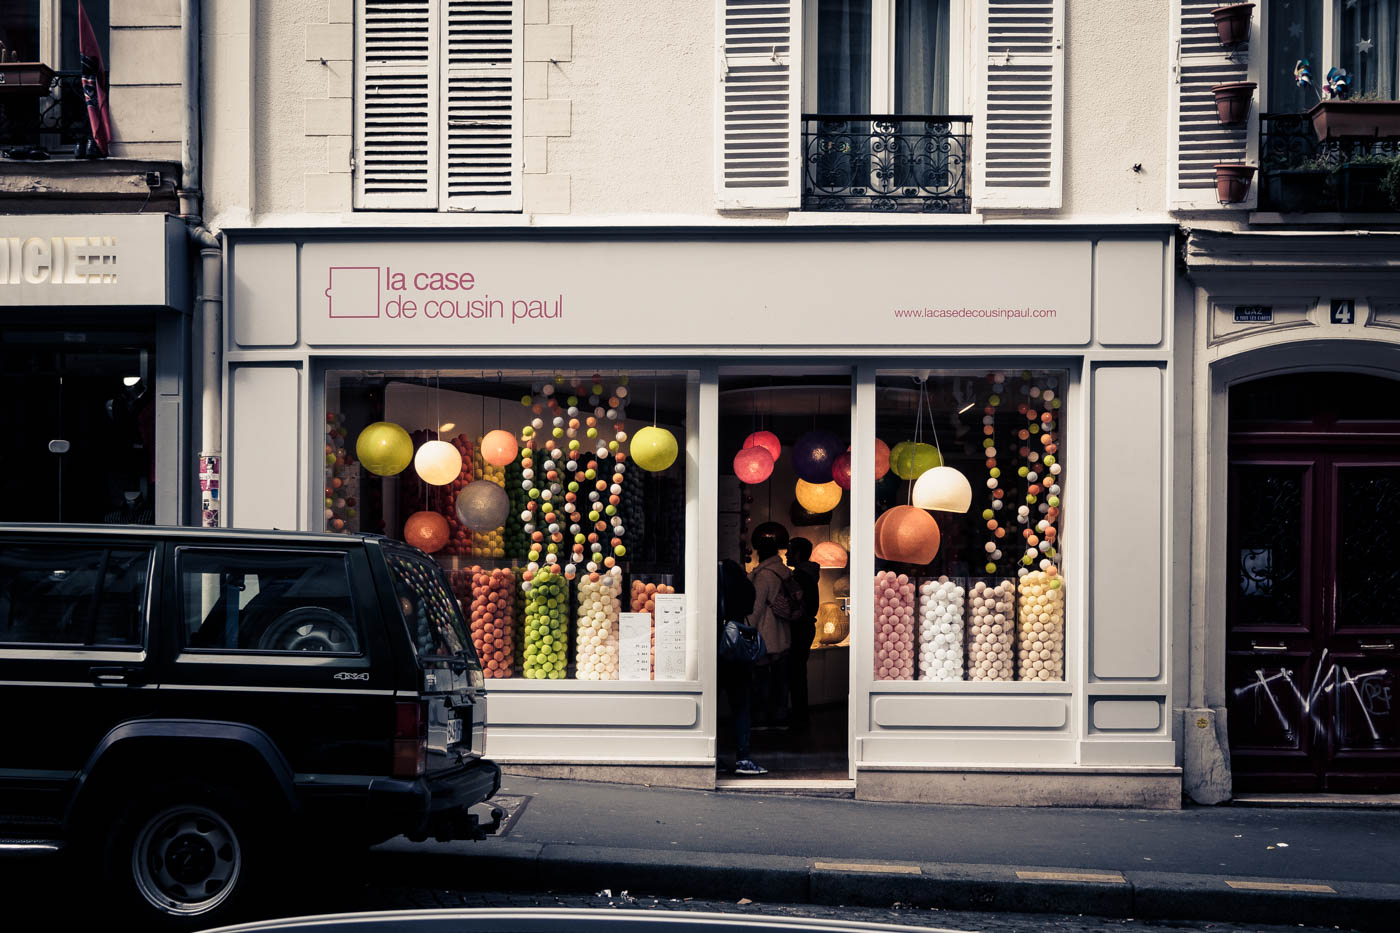 Shop for colorful balls /Fachgeschäft für bunte Bälle